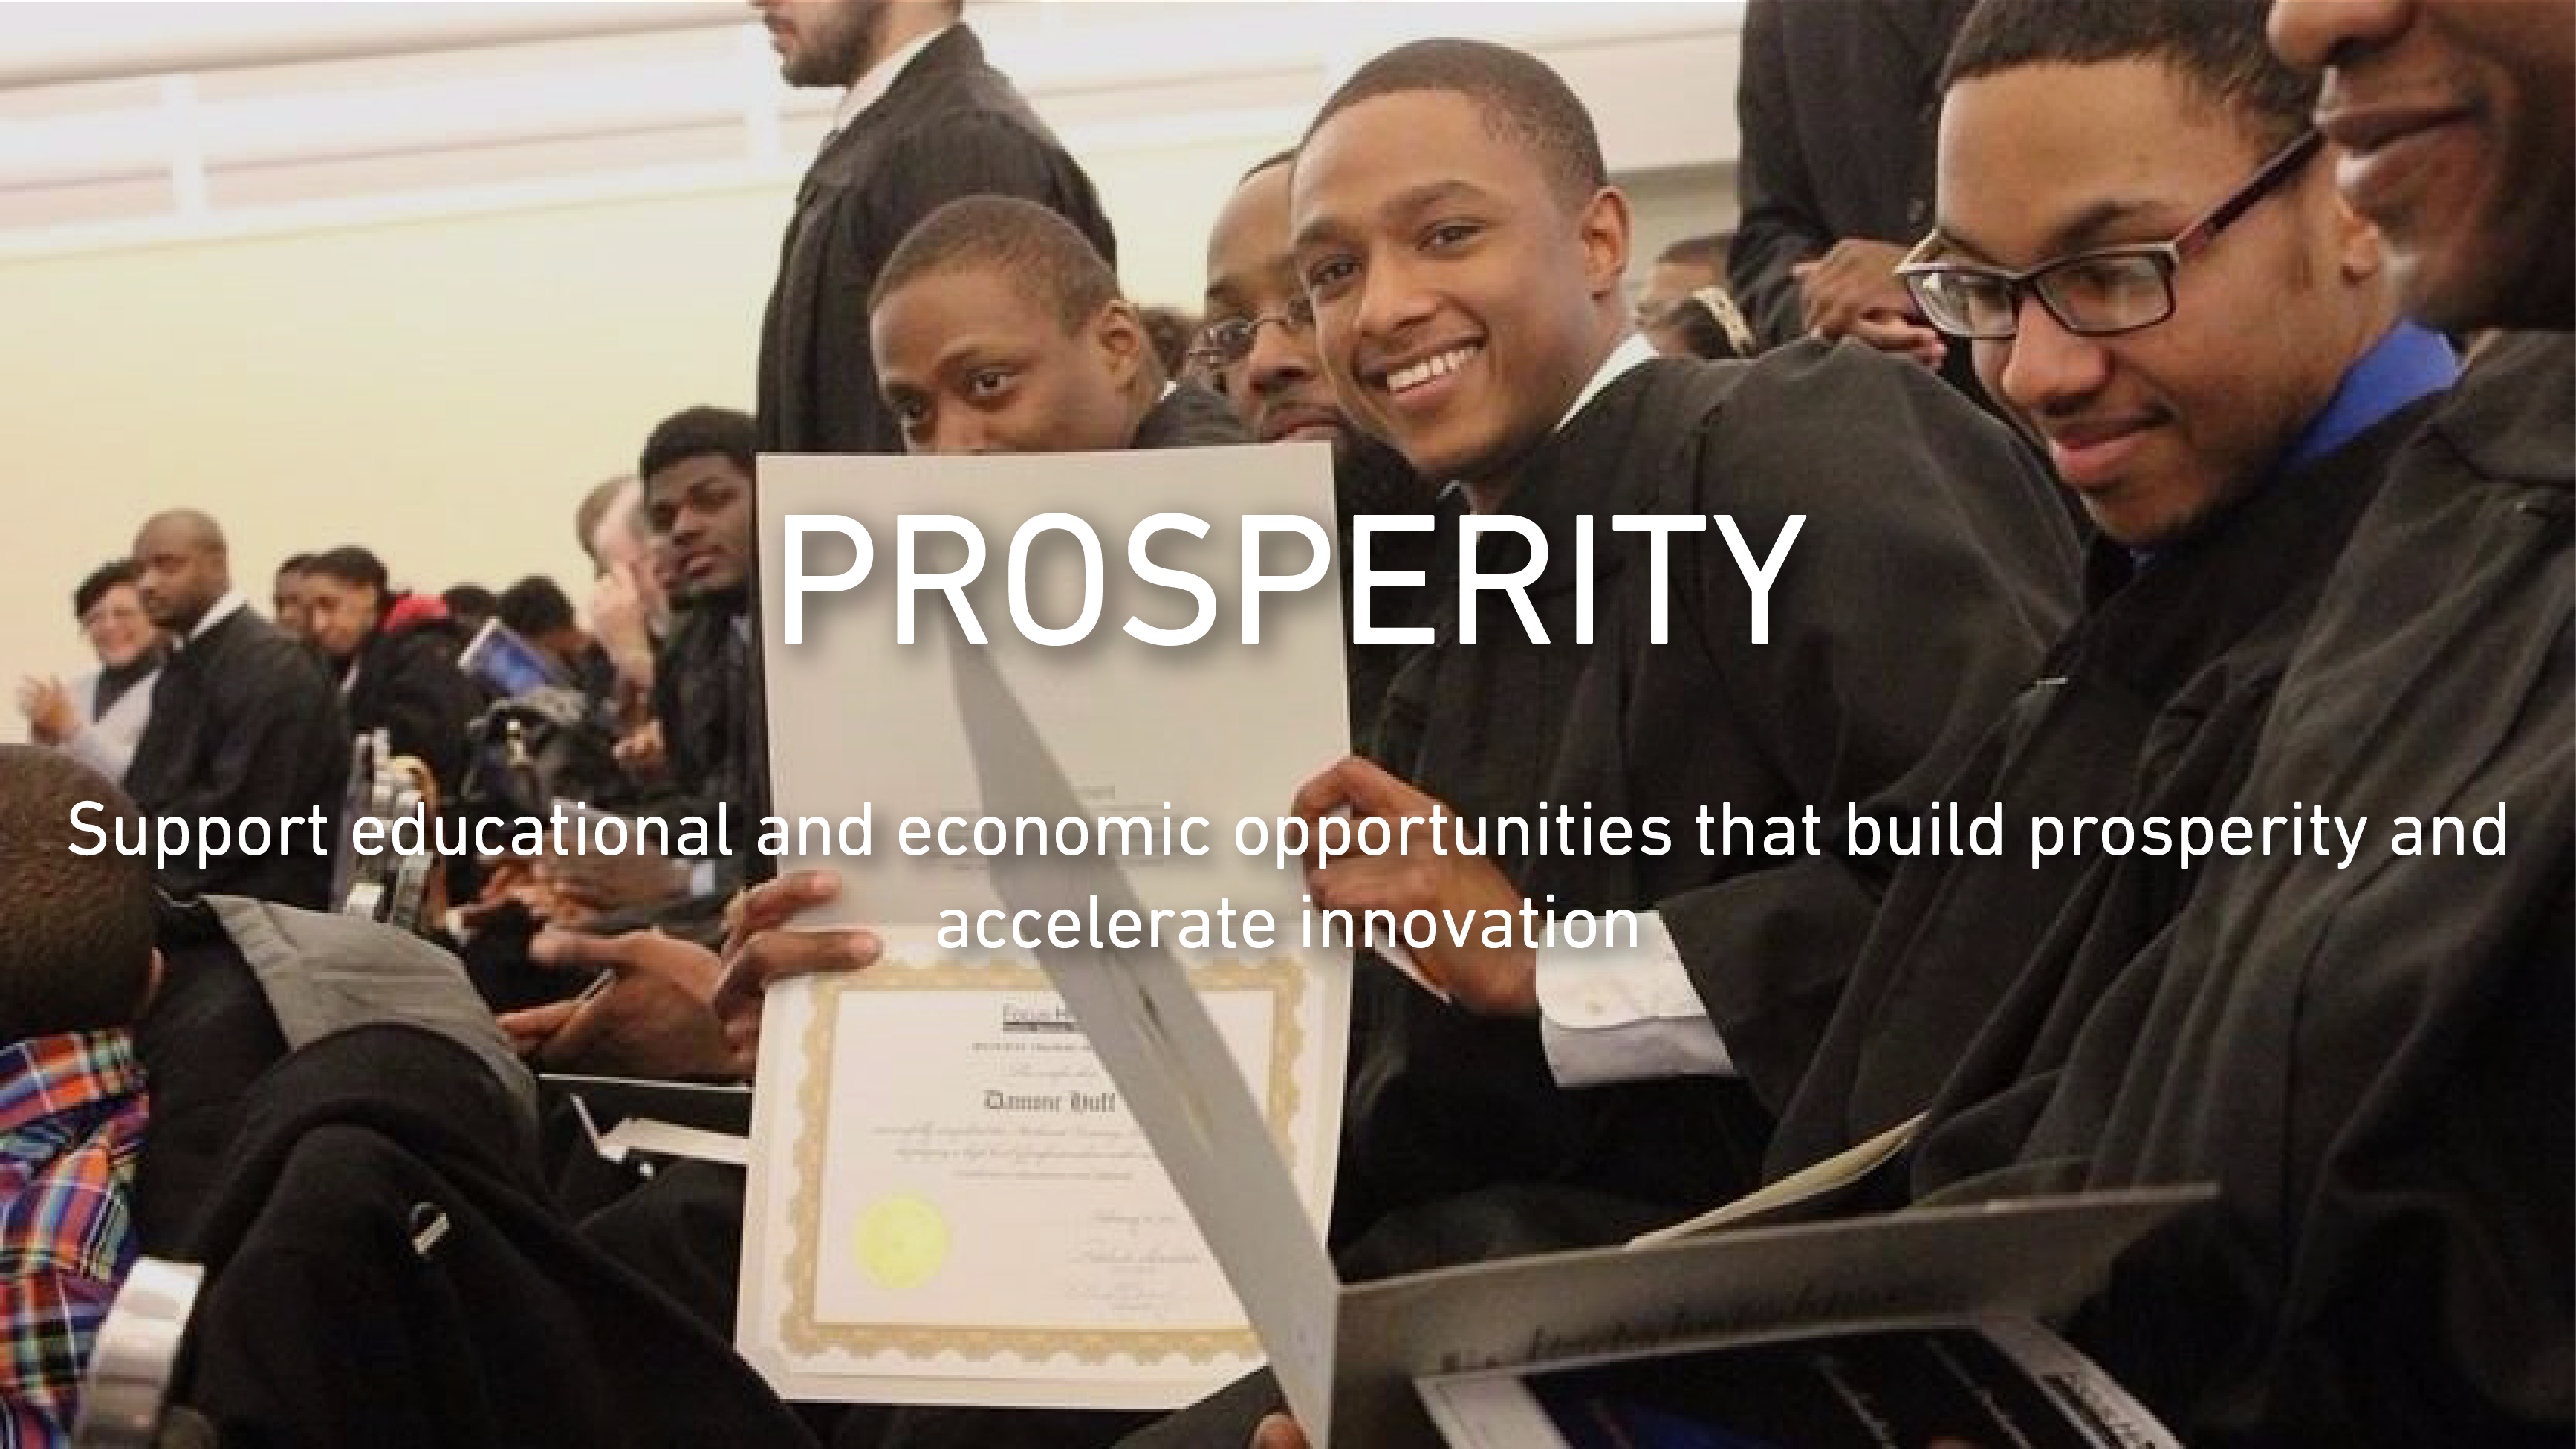 Prosperity-05